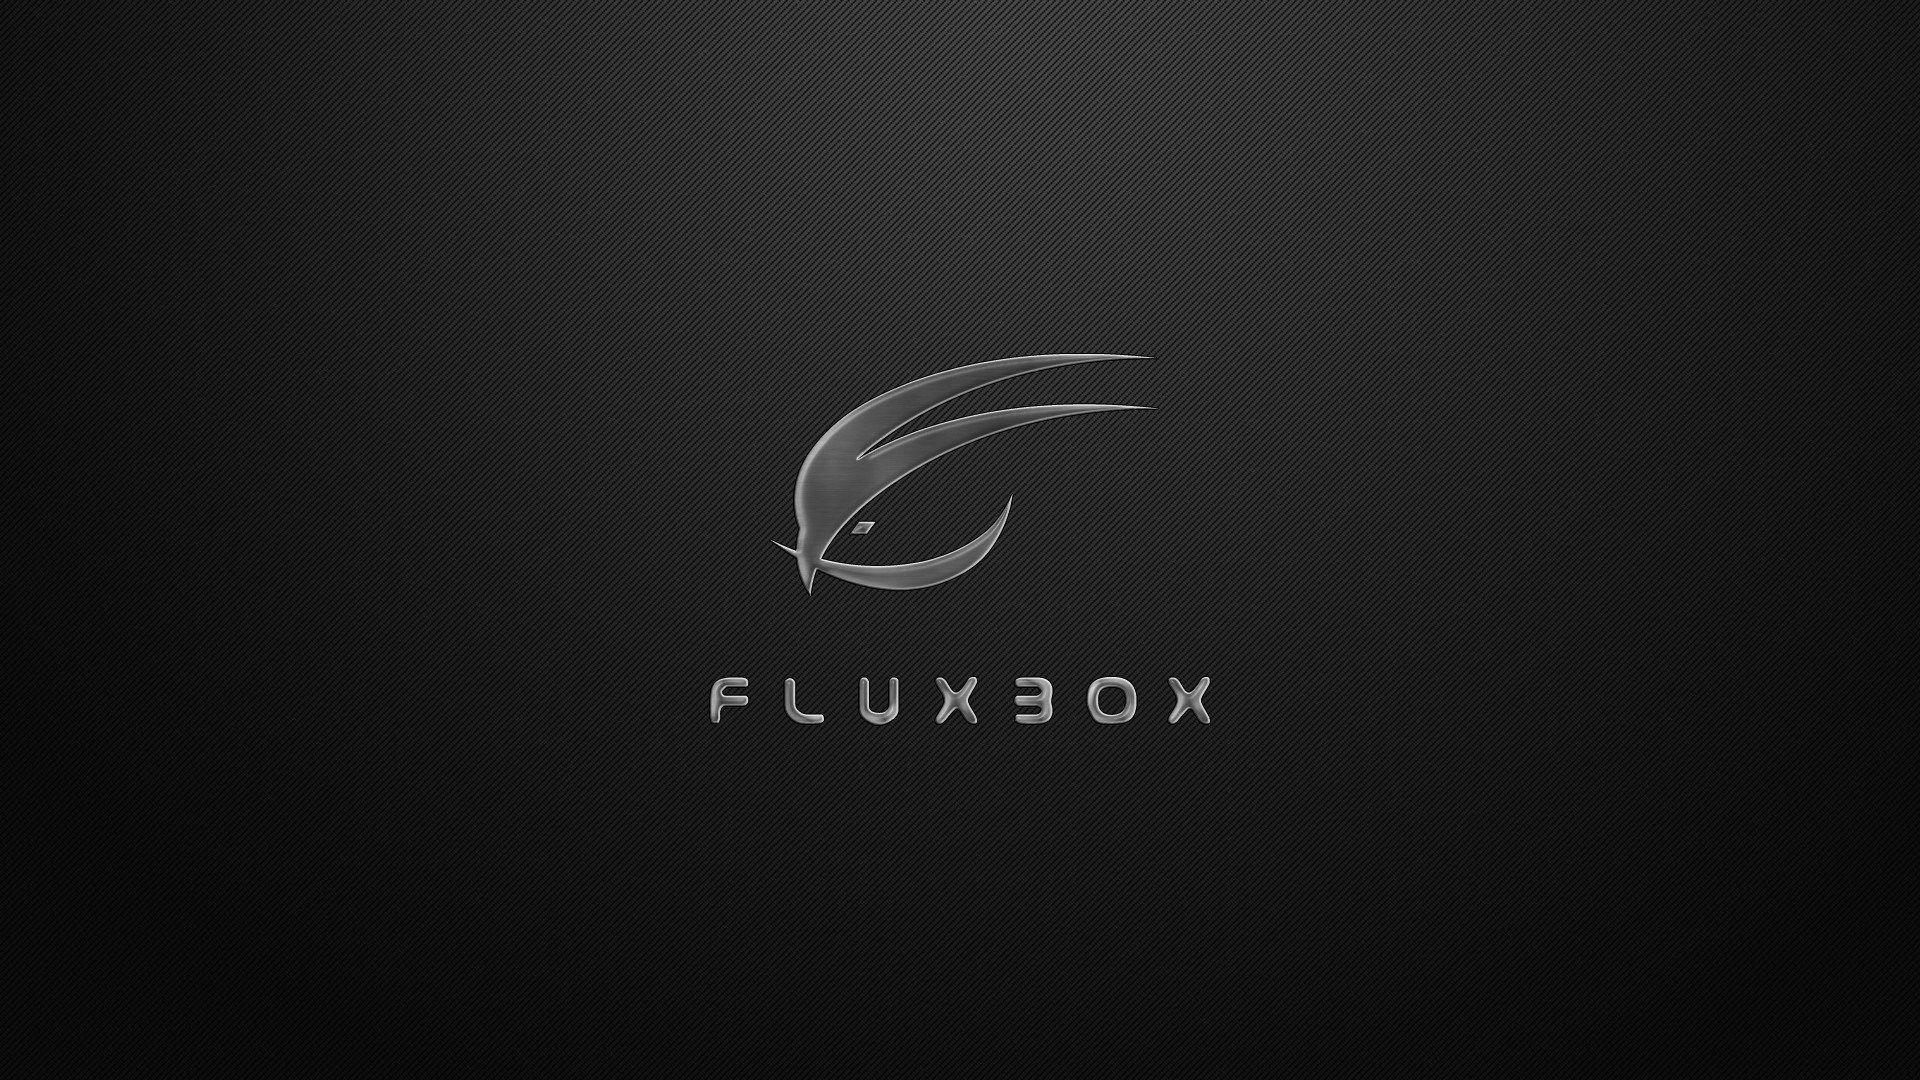 linux wallpapers fluxbox gypsy image ololoshenka Wallpaper 1920x1080